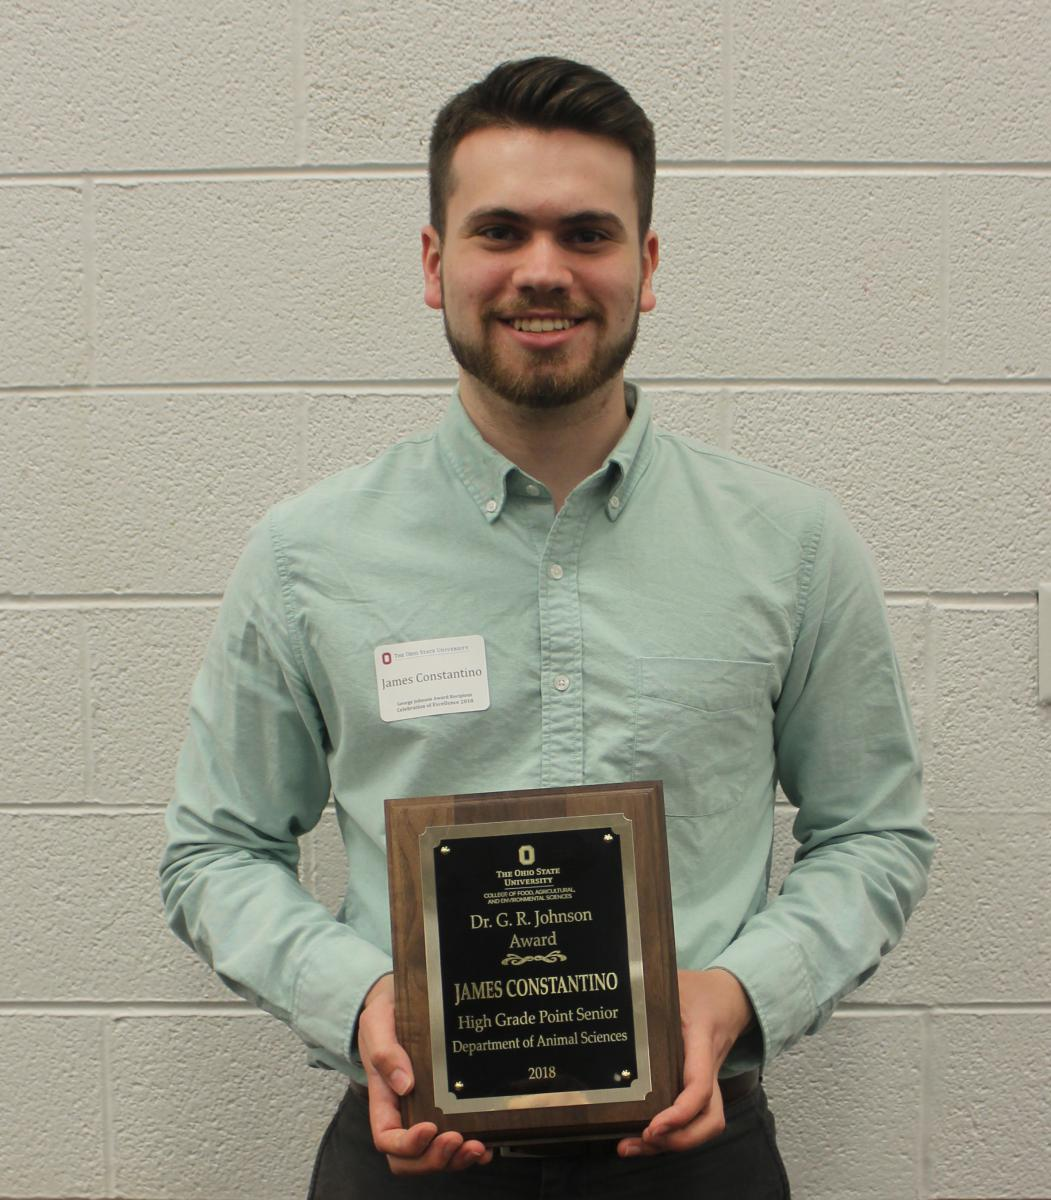 Dr. George R. Johnson Award winner James Constantino